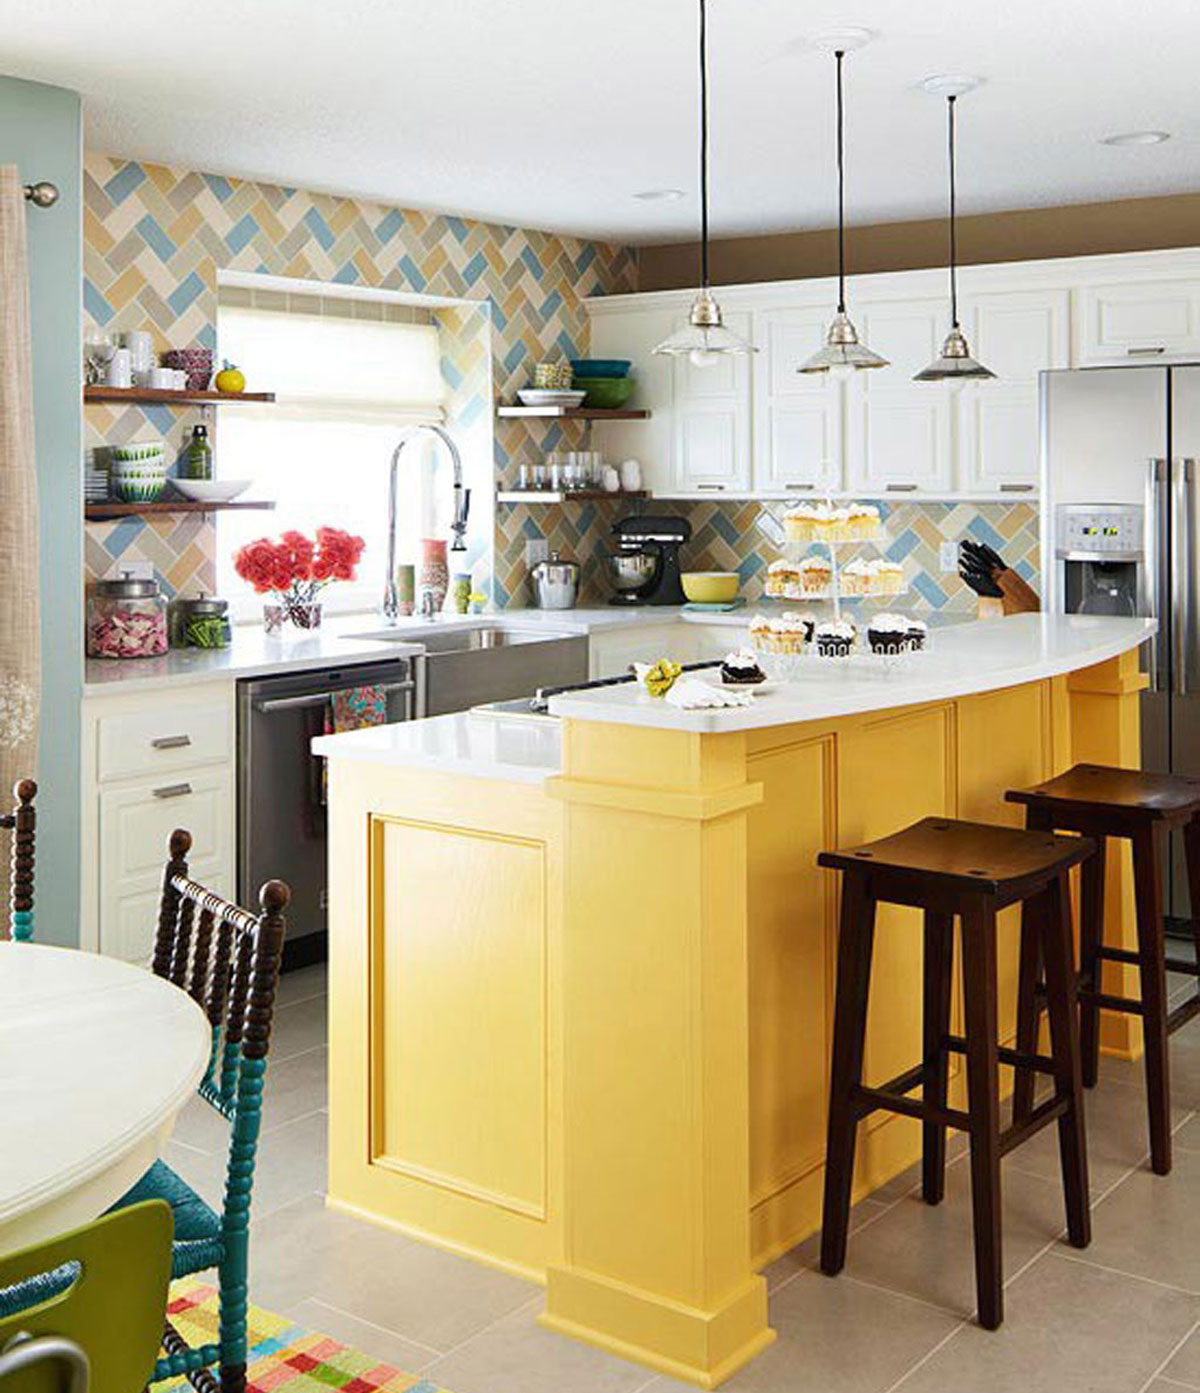 Yellow Small Kitchen Appliances: Fantastična Inspiracija Za žutu Kuhinju